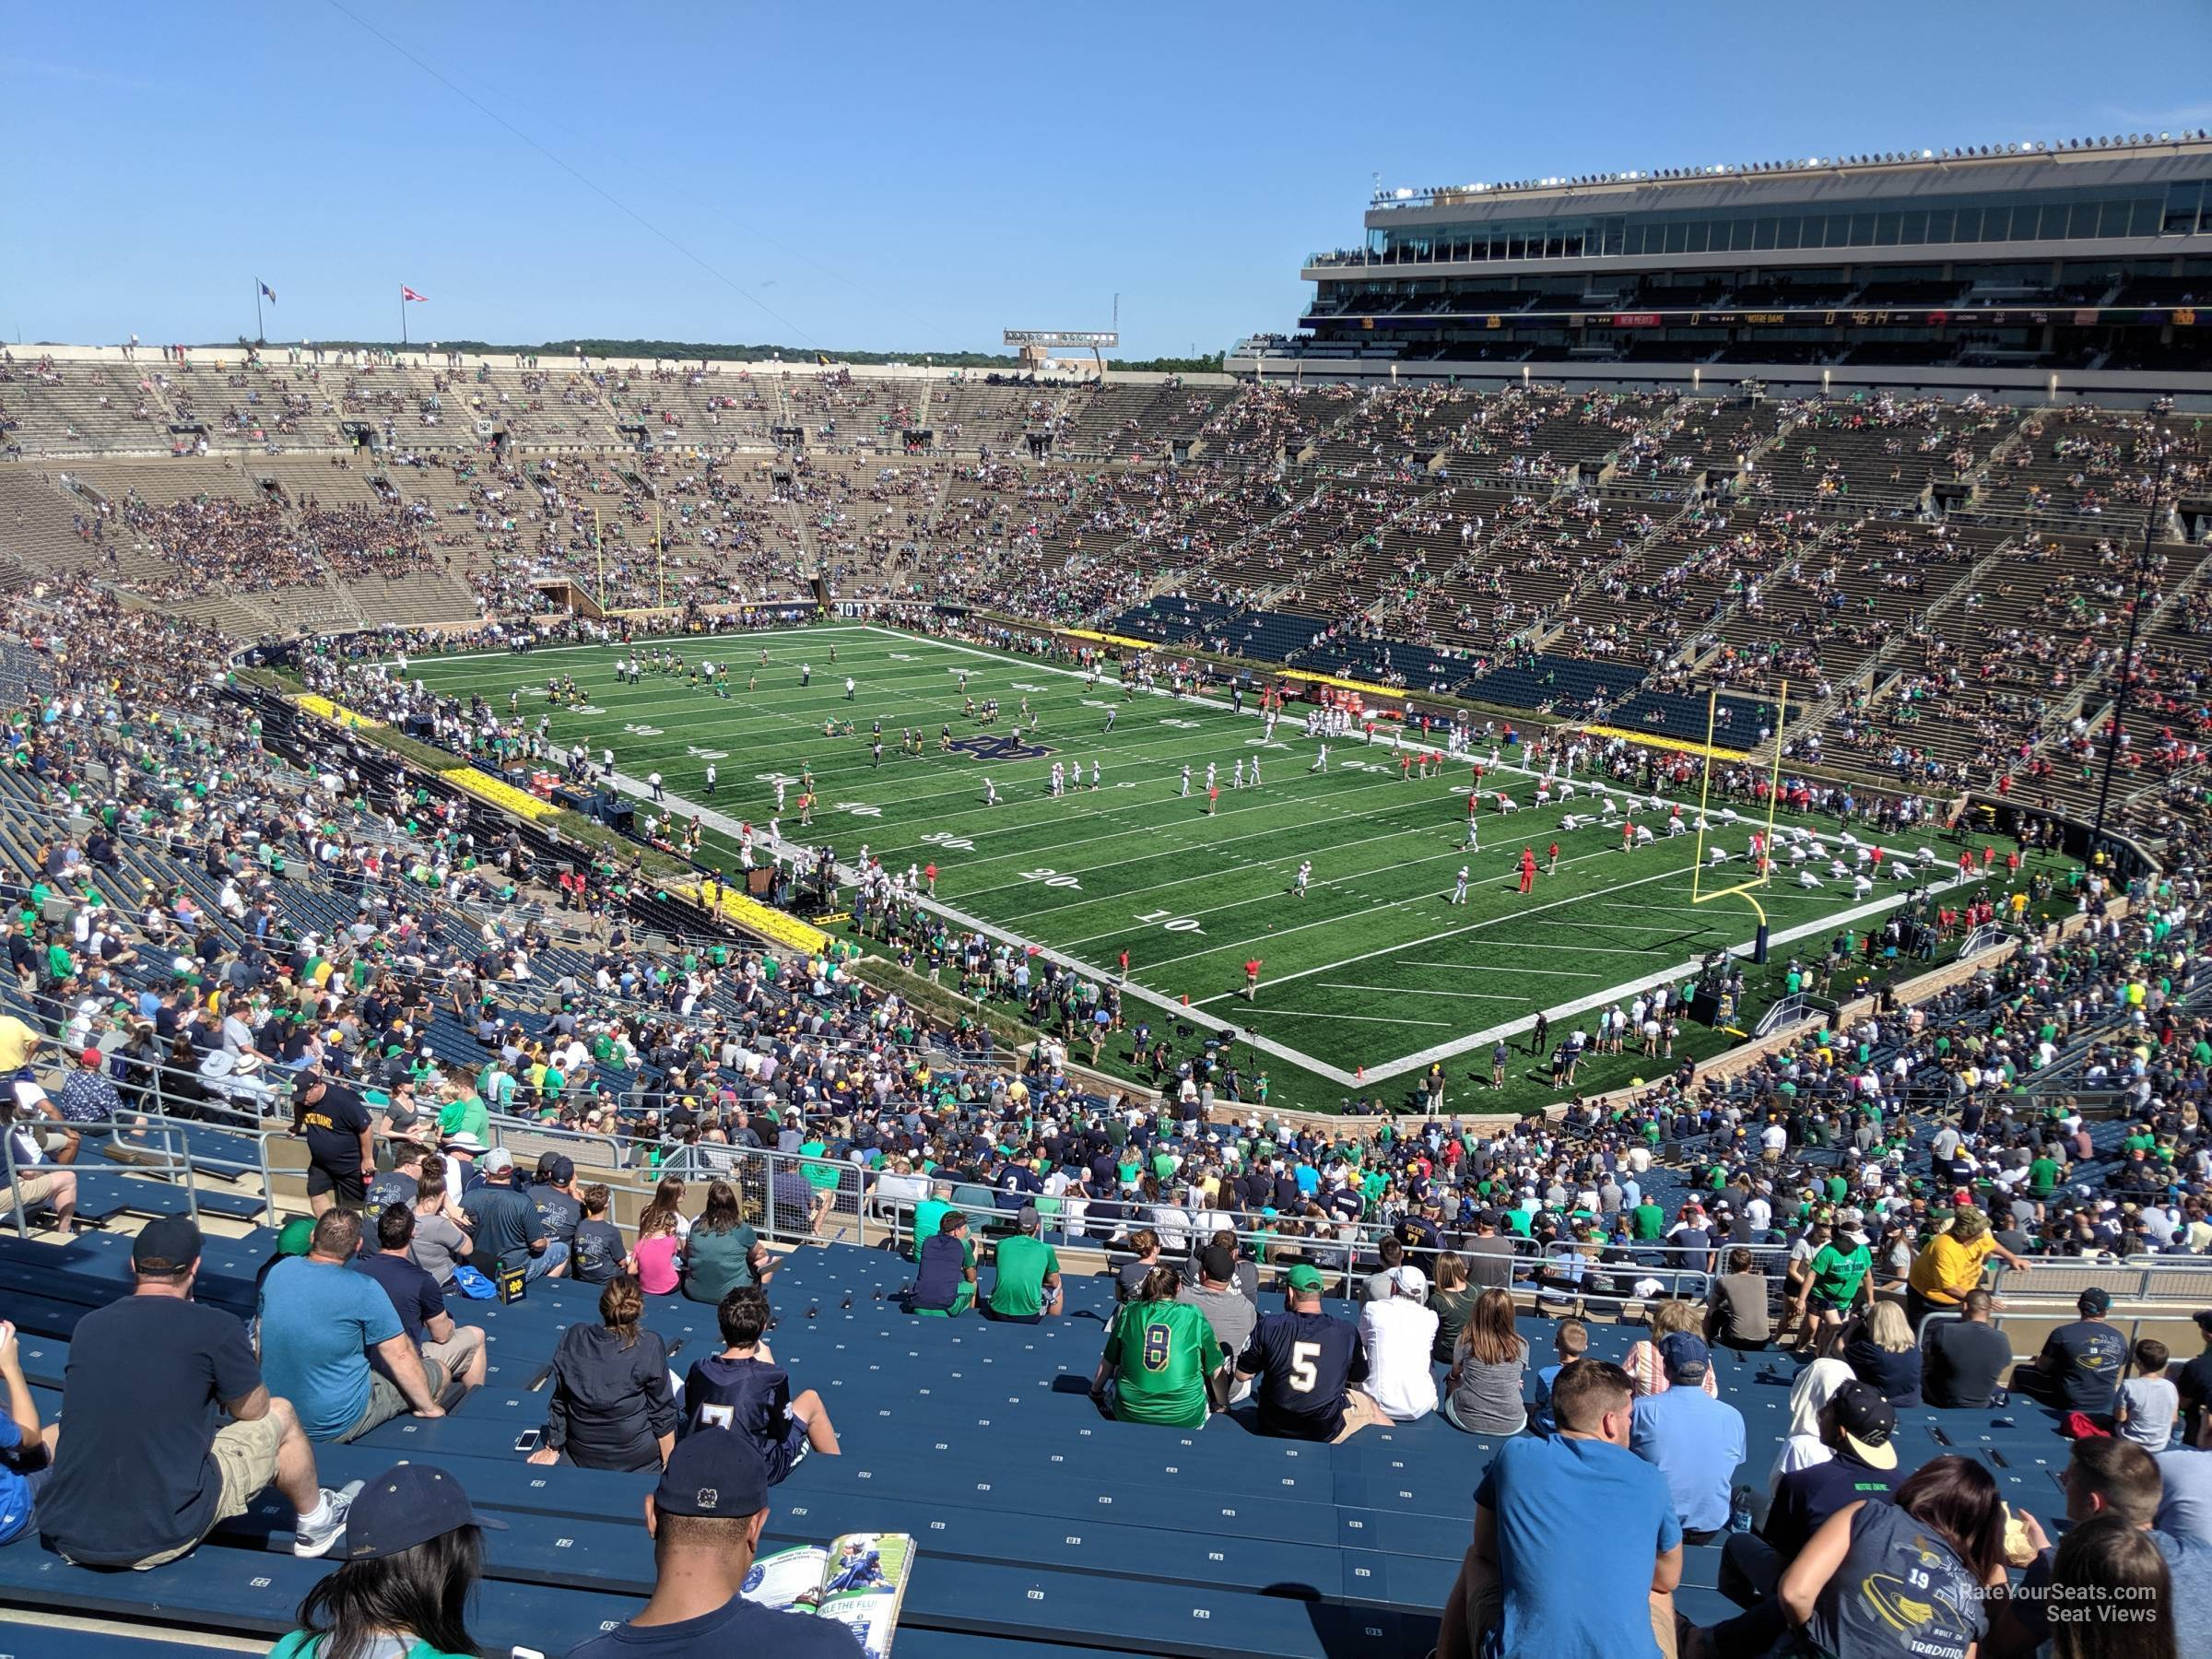 Notre Dame Stadium Section 123 - RateYourSeats.com